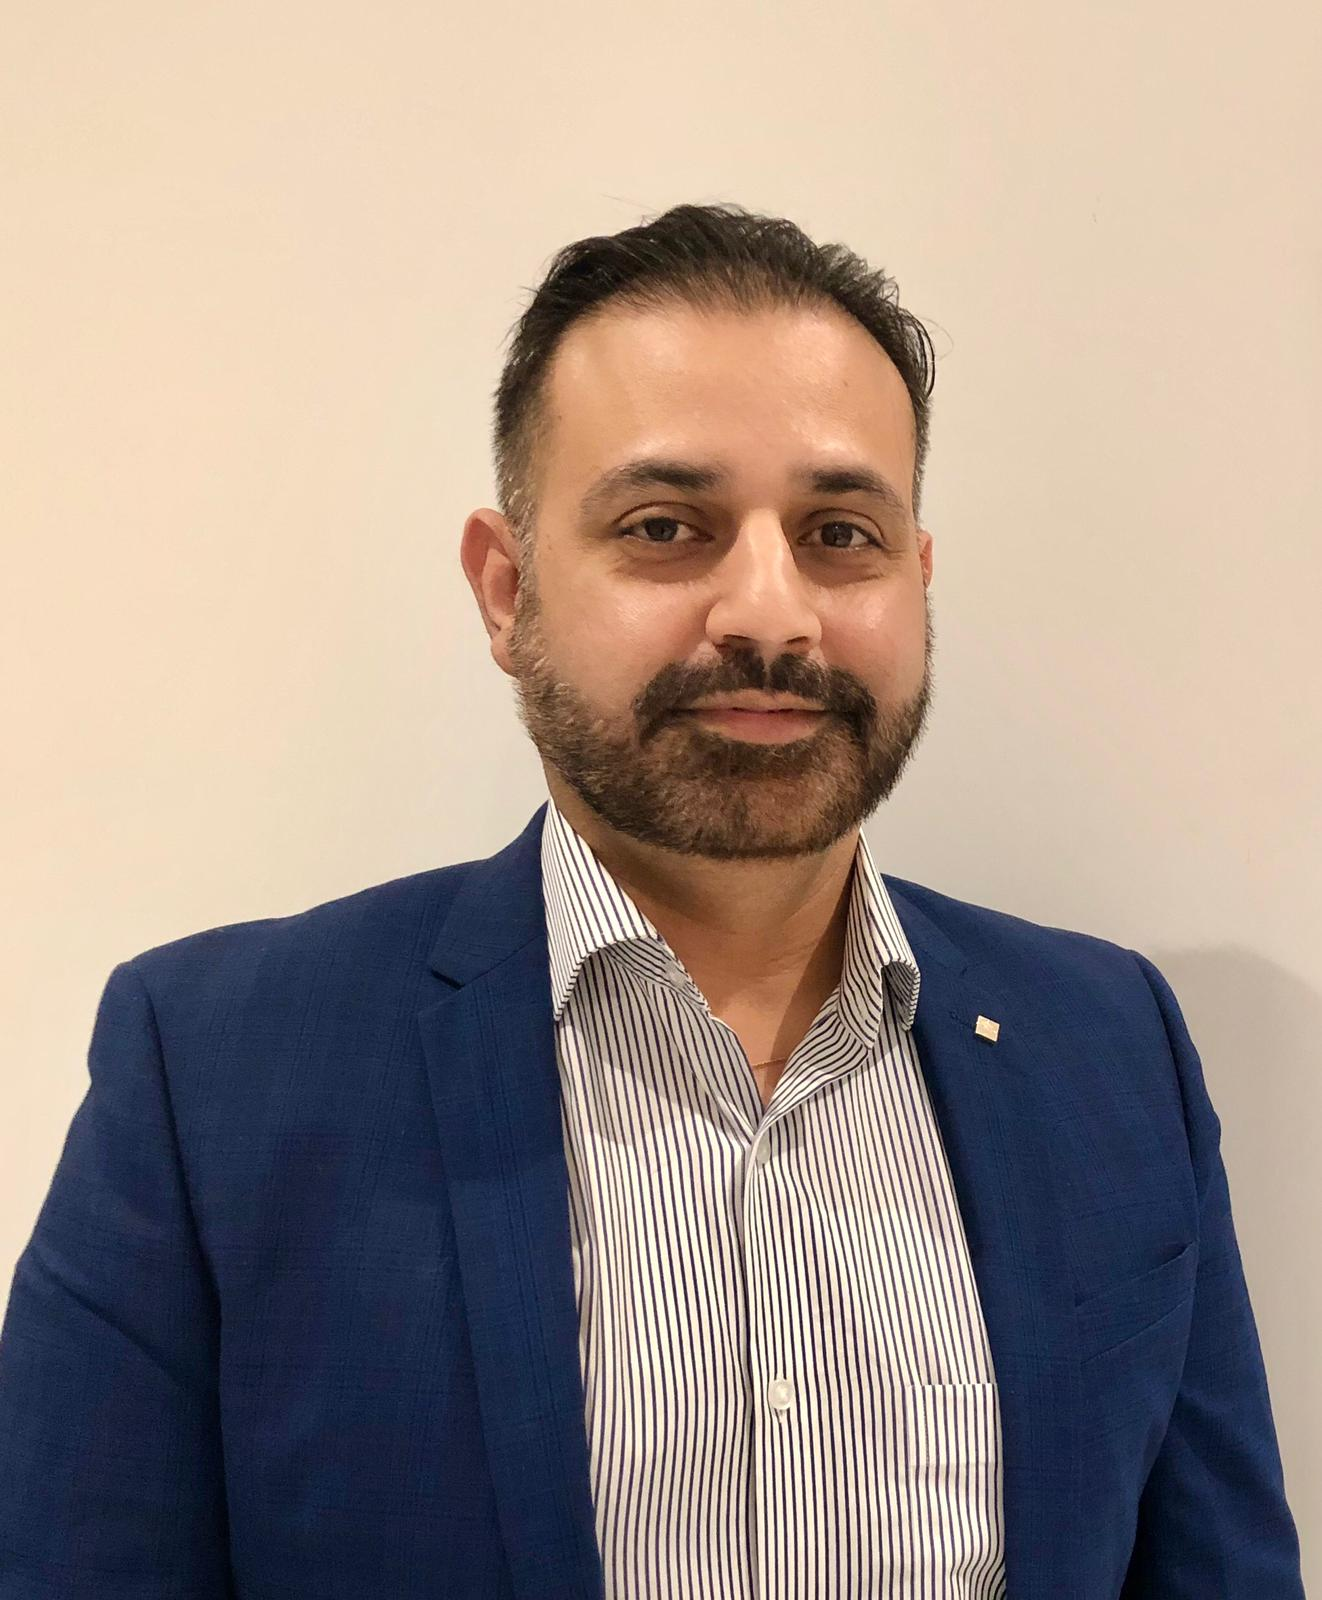 Dr. Tayyab Ali